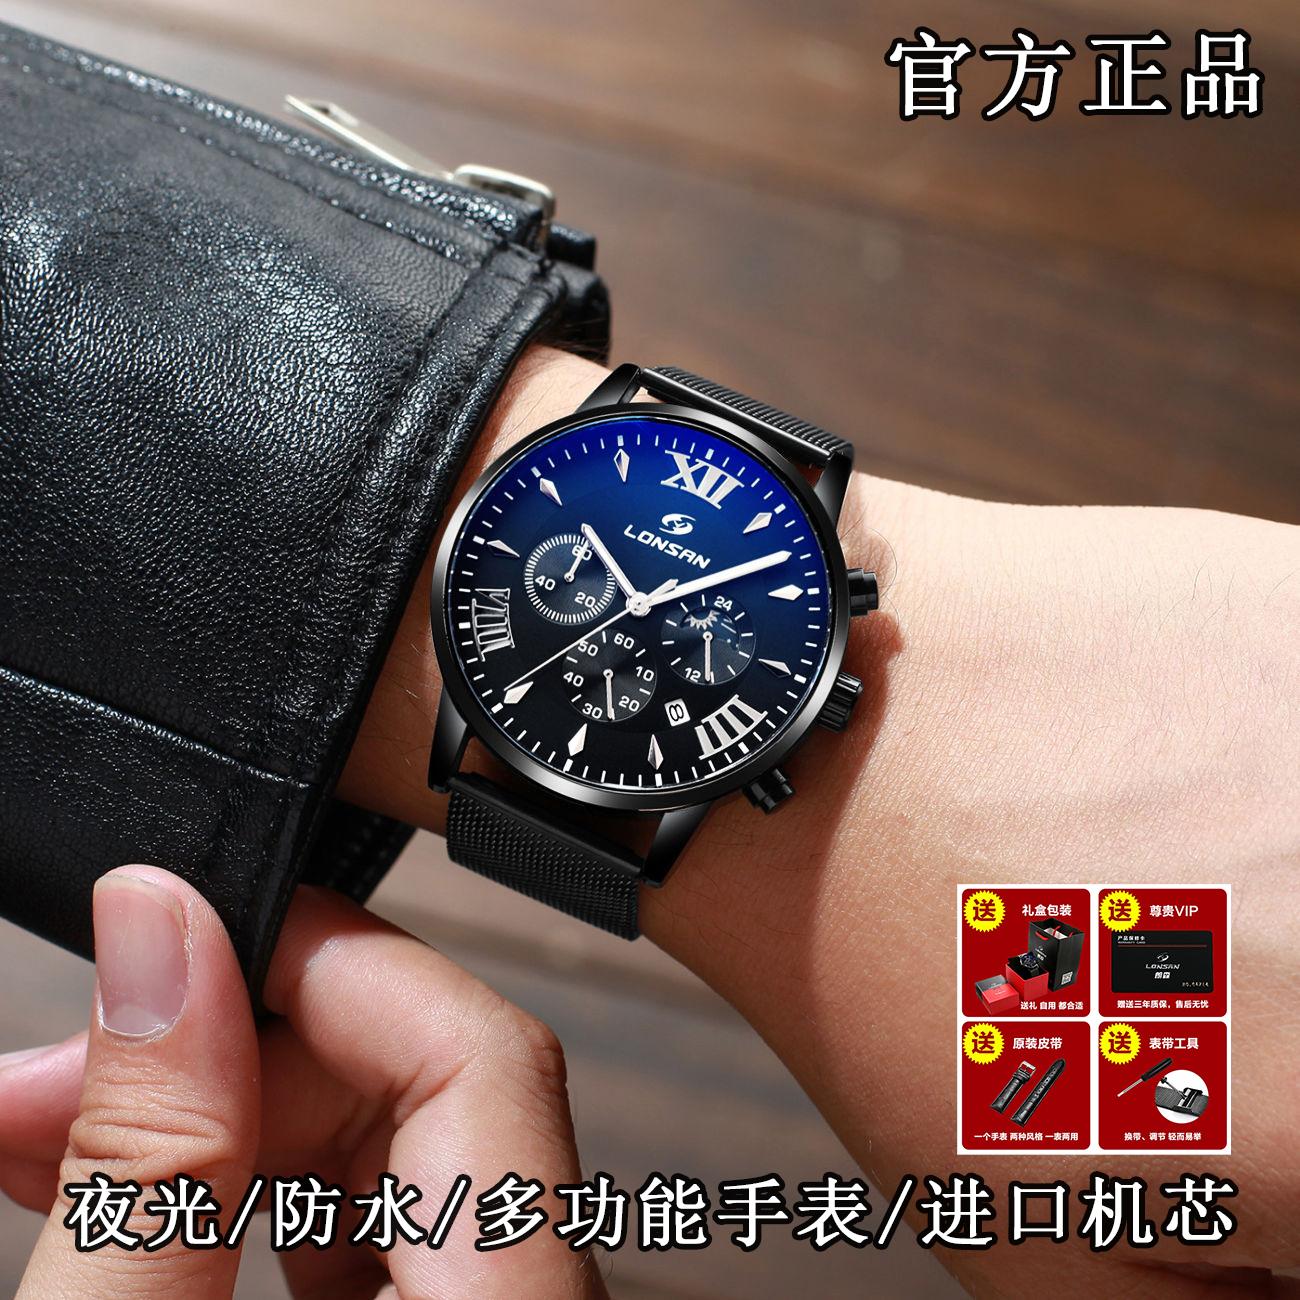 Ronson boys trend Korean fashion concept non automatic mechanical electronic black technology quartz waterproof watch